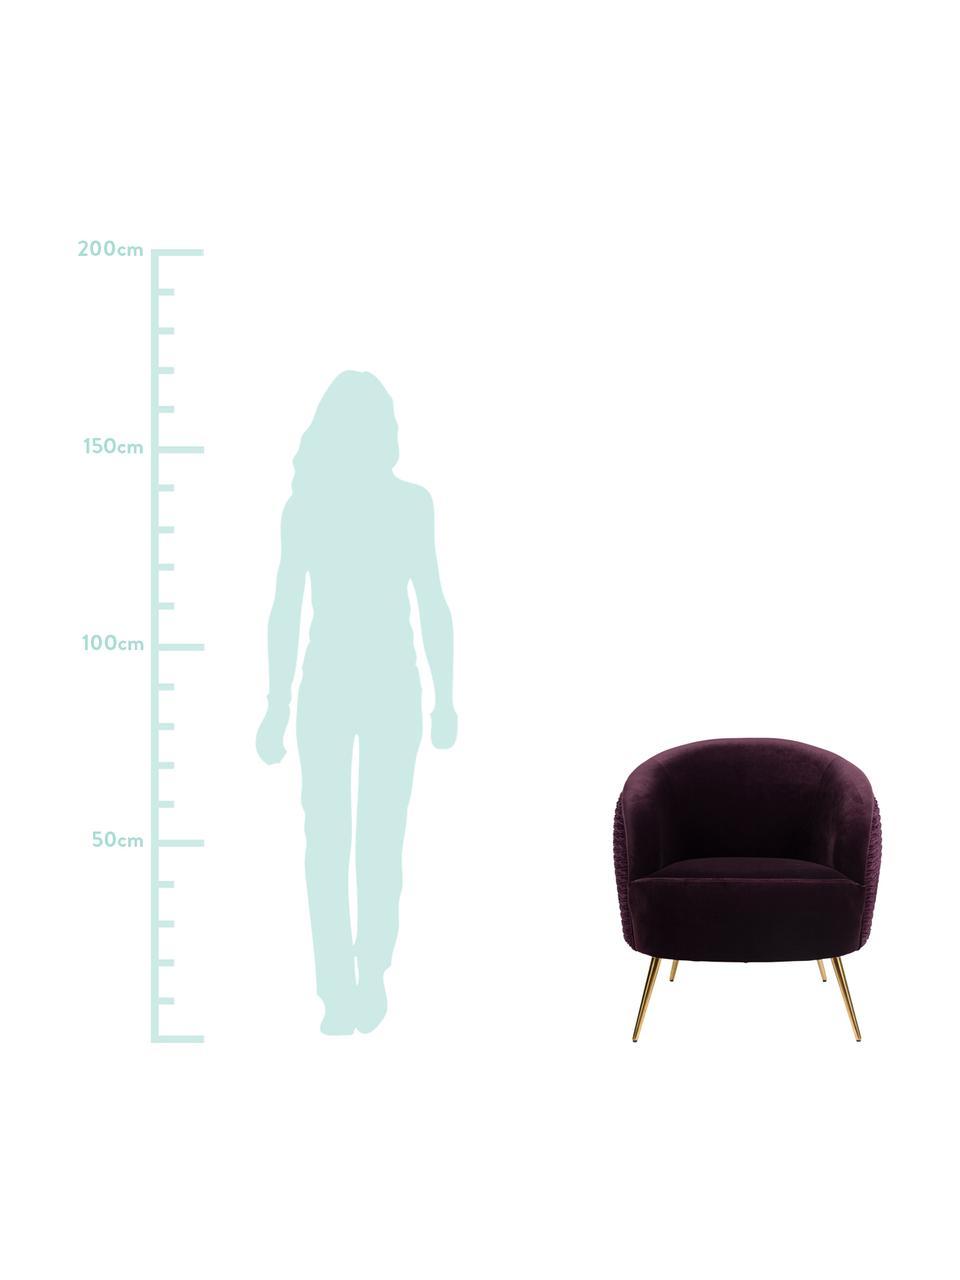 Samt-Cocktailsessel So Curvy in Lila, Bezug: Polyestersamt Der hochwer, Füße: Edelstahl, galvanisiert, Samt Lila, B 78 x T 77 cm